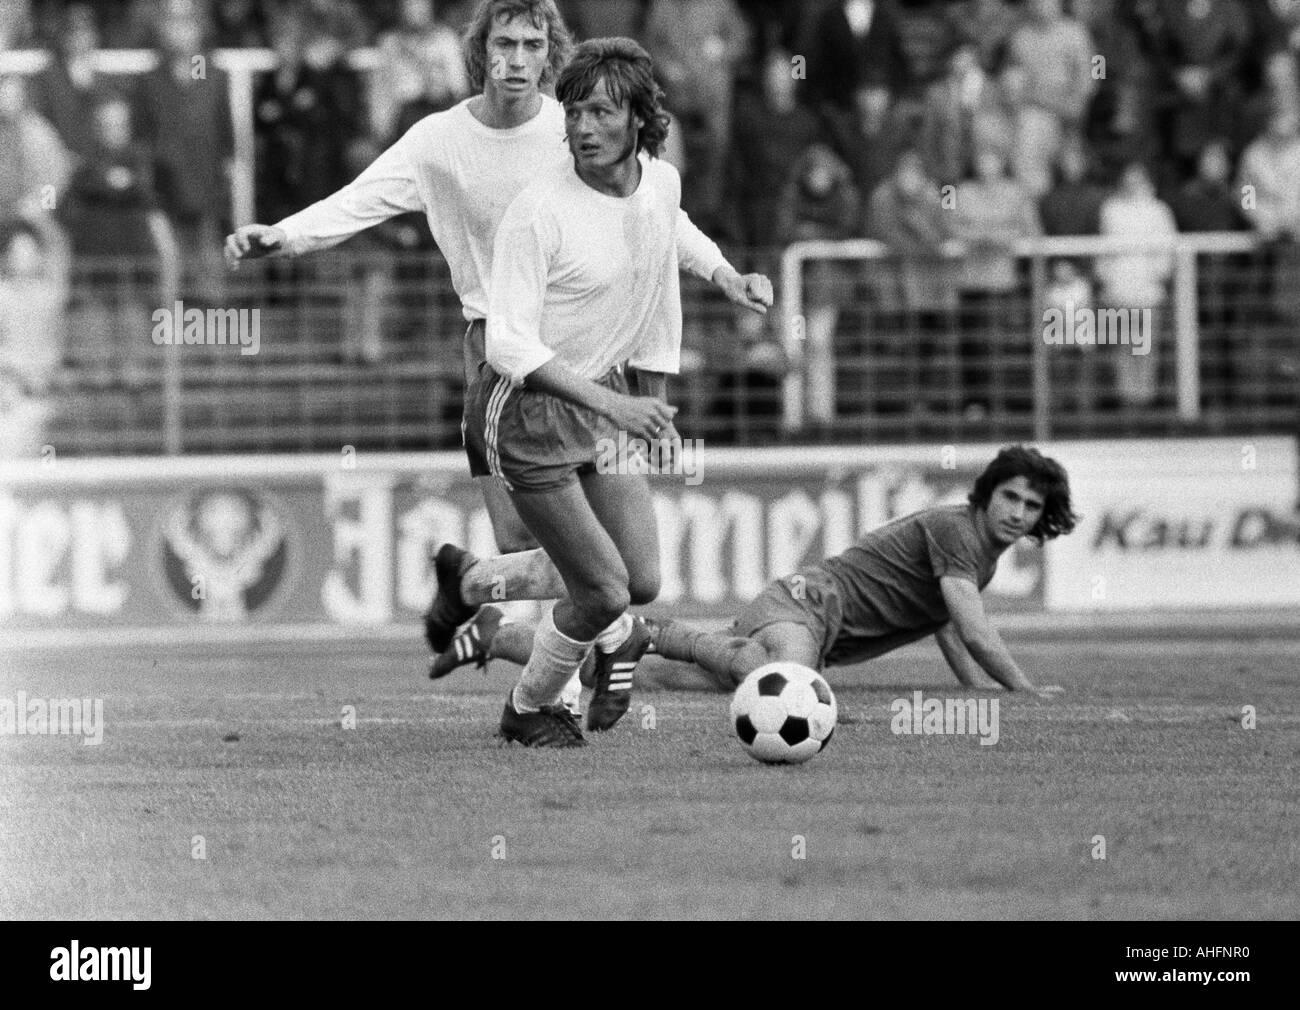 football, Bundesliga, 1972/1973, Niederrhein Stadium in Oberhausen, Rot-Weiss Oberhausen versus FC Bayern Munich 0:5, scene of the match, f.l.t.r. Ditmar Jakobs (RWO), Gerd Woermer (RWO), Gerd Mueller (FCB) - Stock Image